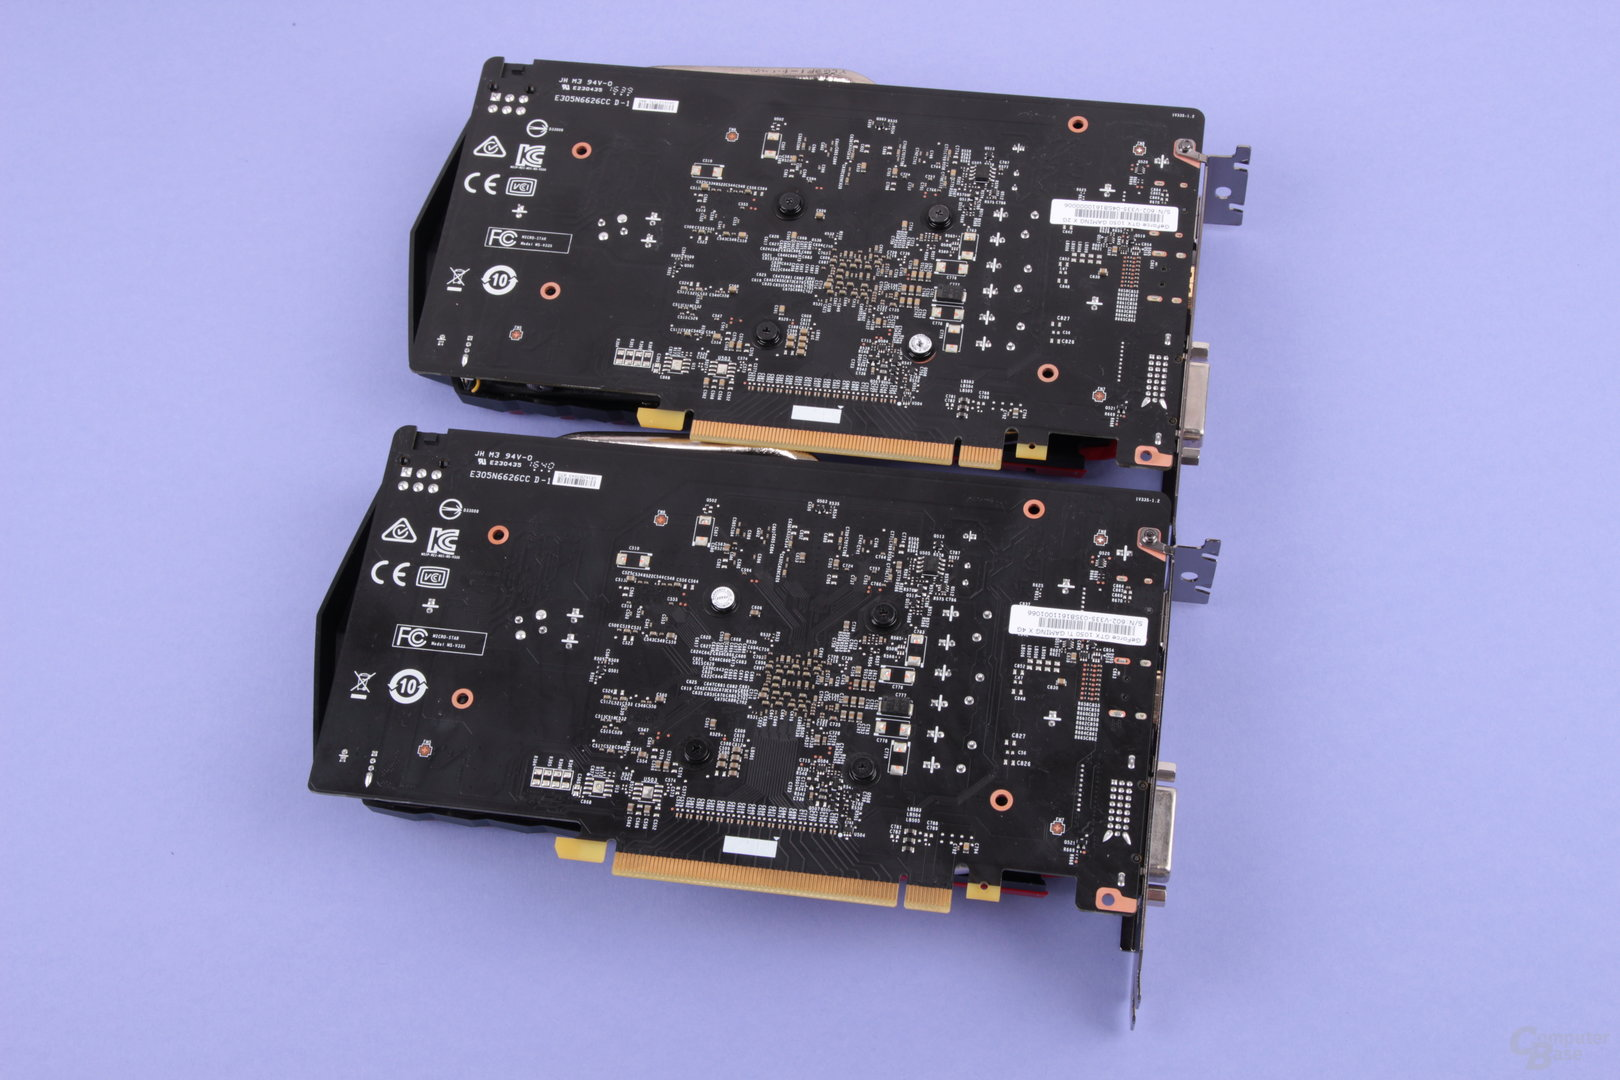 MSI GTX 1050 Gaming (oben) und GTX 1050 Ti Gaming (unten)